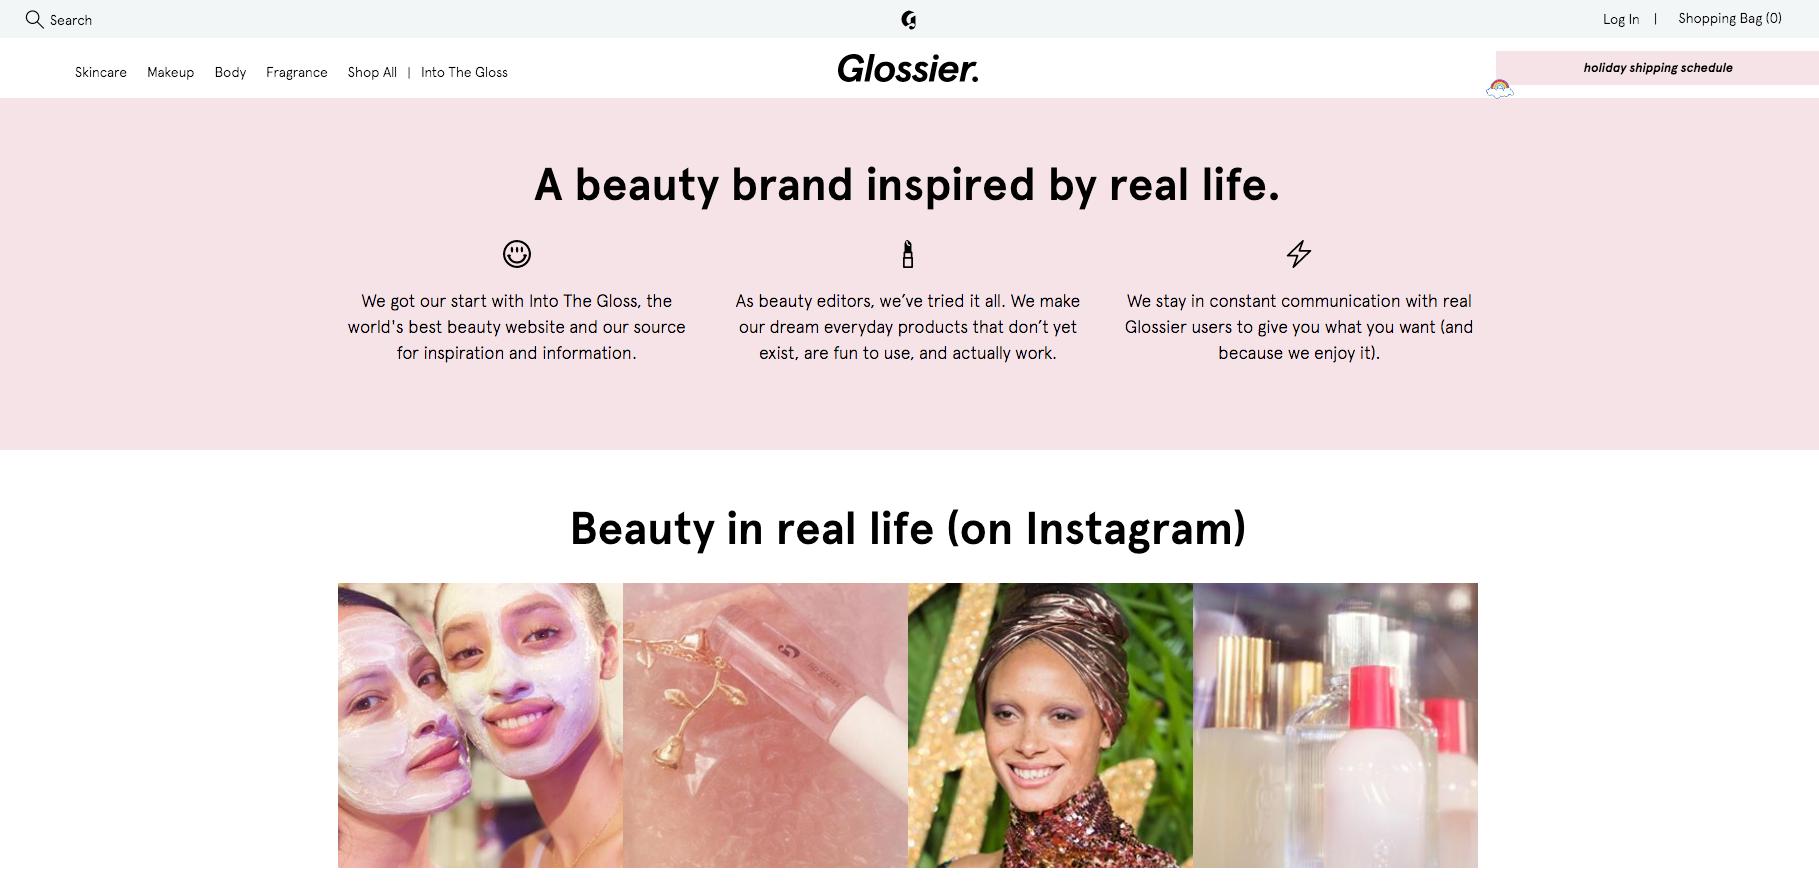 Glossier Instagram Feed on Homepage